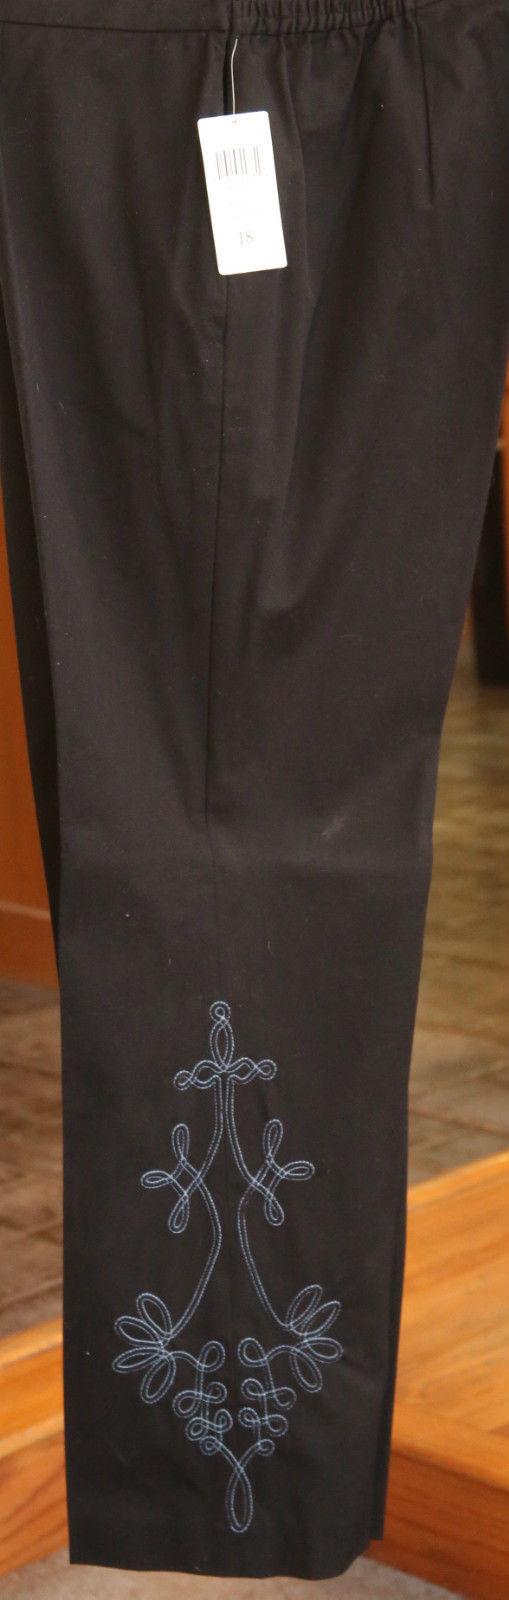 DANA BUSHMAN APHRODITE BLACK STRETCH DRESS PANT WOMEN 18 $198 EMBROIDERED NWT - $26.72